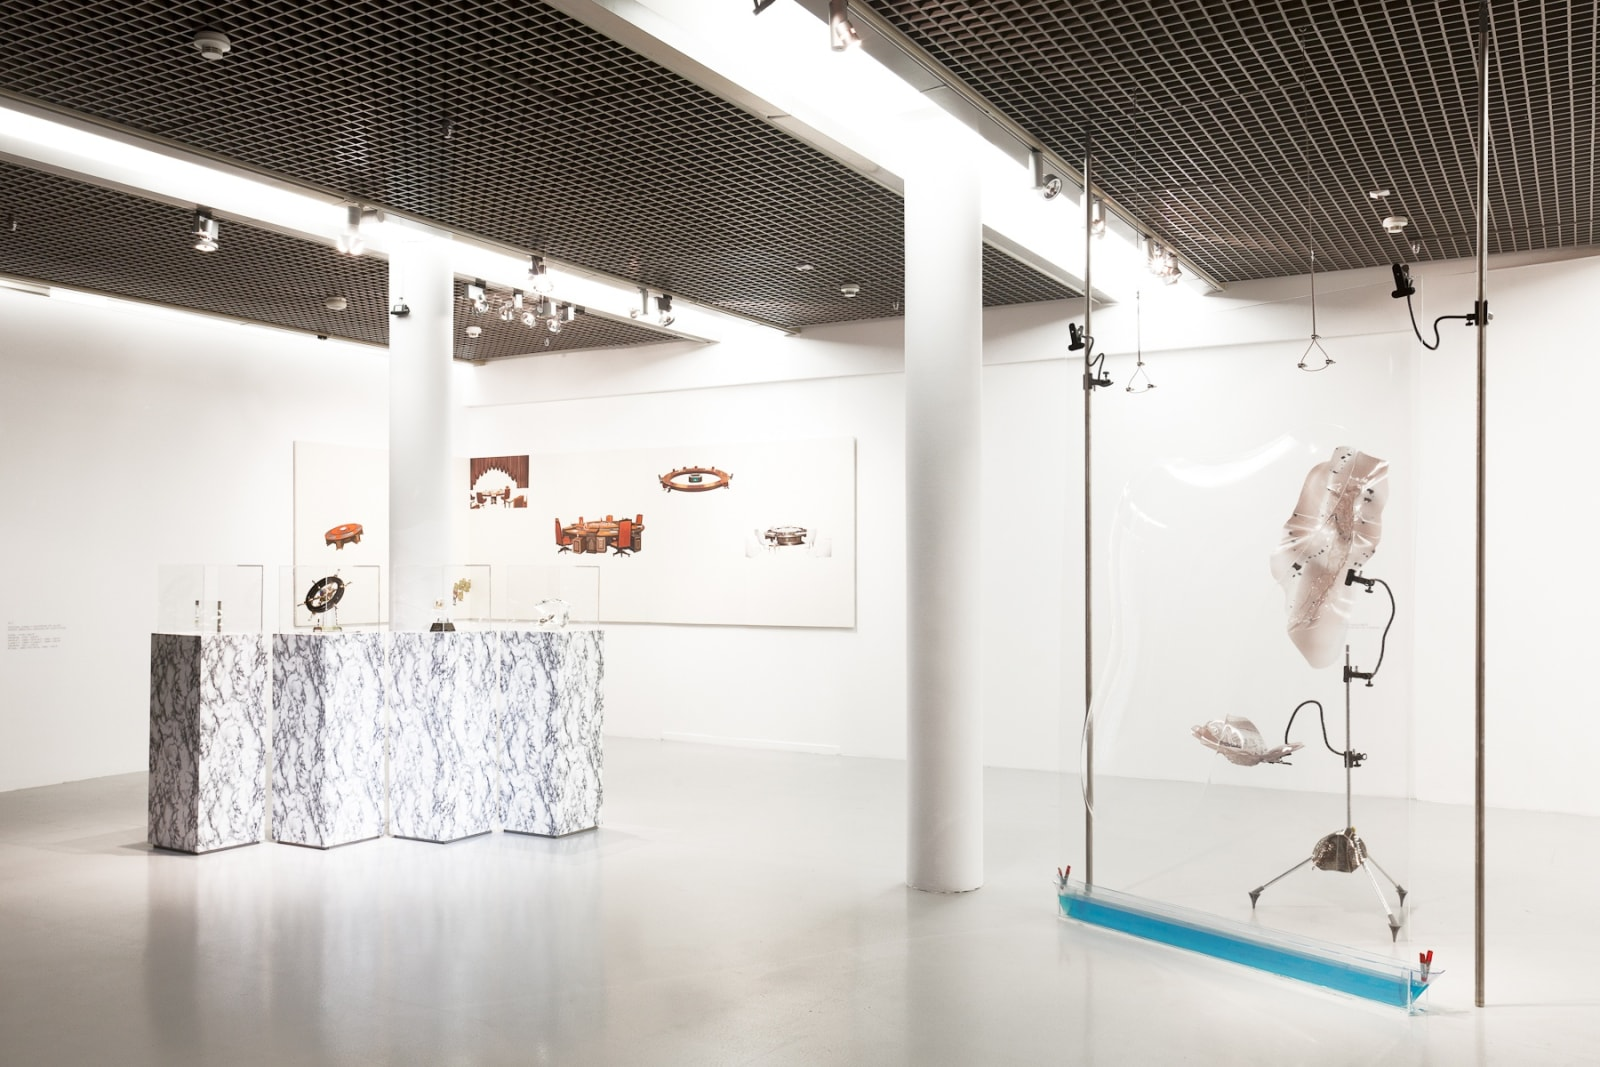 GCC exhibition view, Peer to Peer - Collective Practices in Art , Muzeum Sztuki, Łódź, 2018